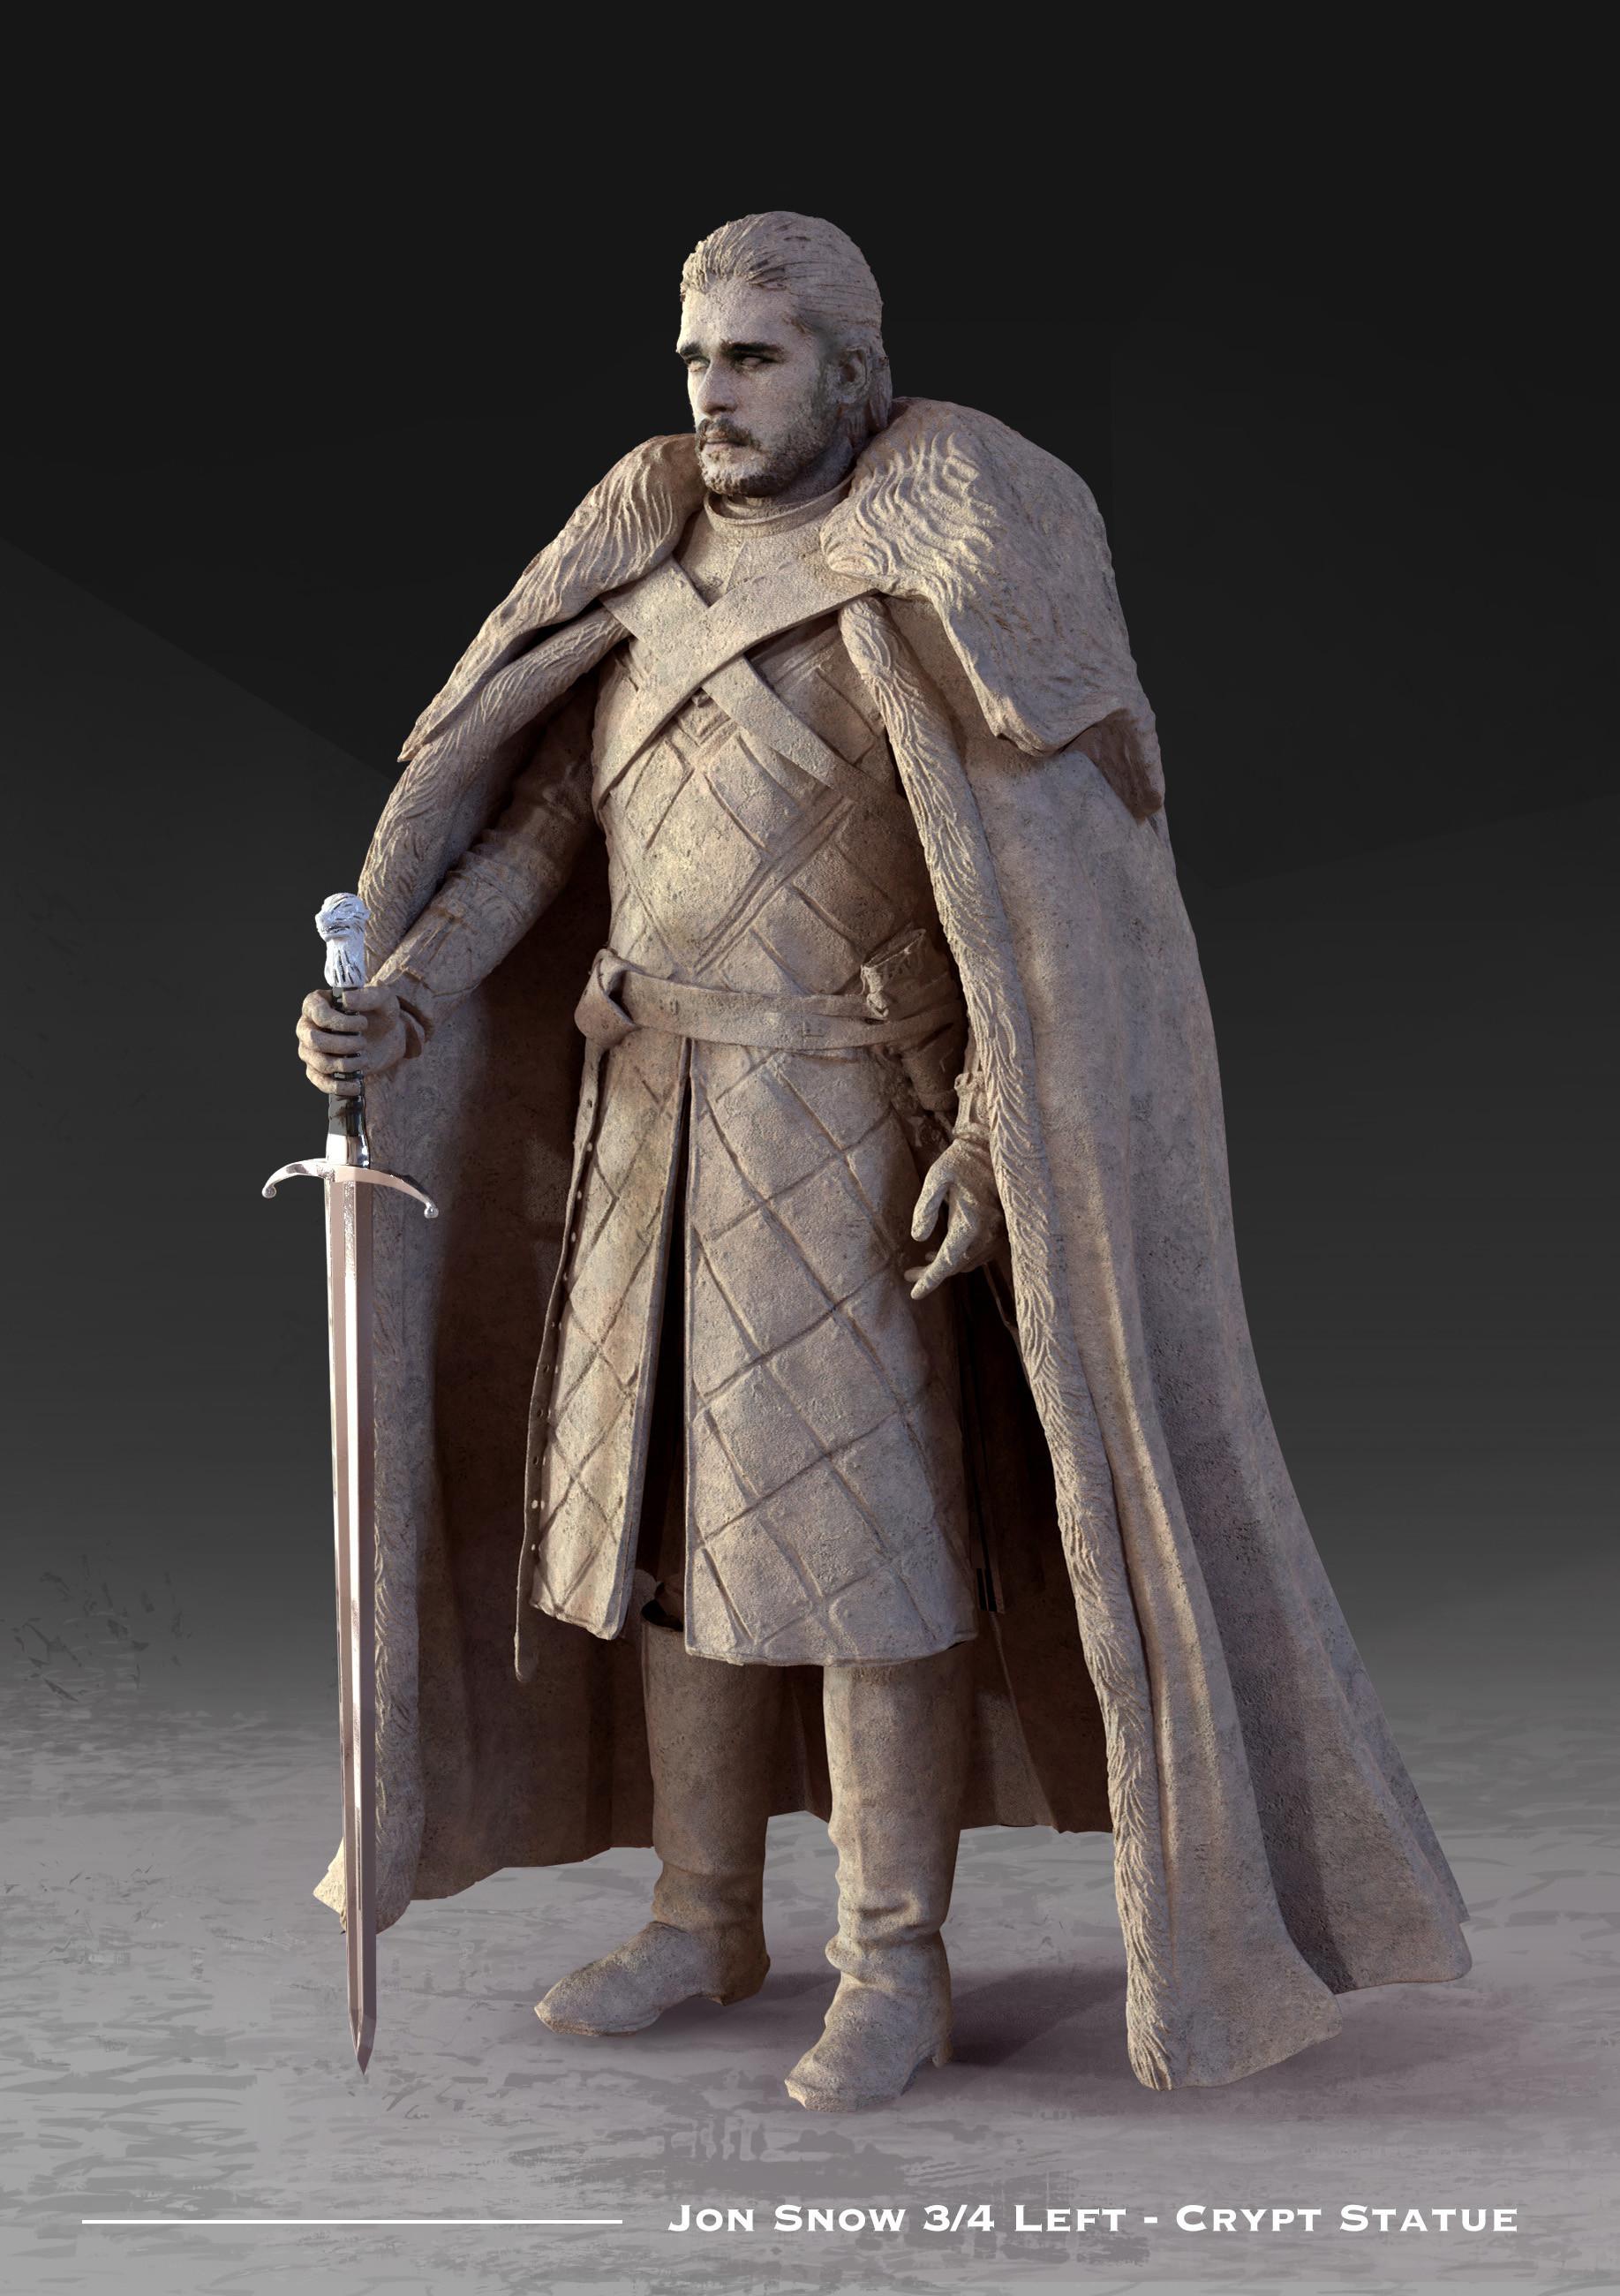 Kieran belshaw jon statue 3quarterleft v001